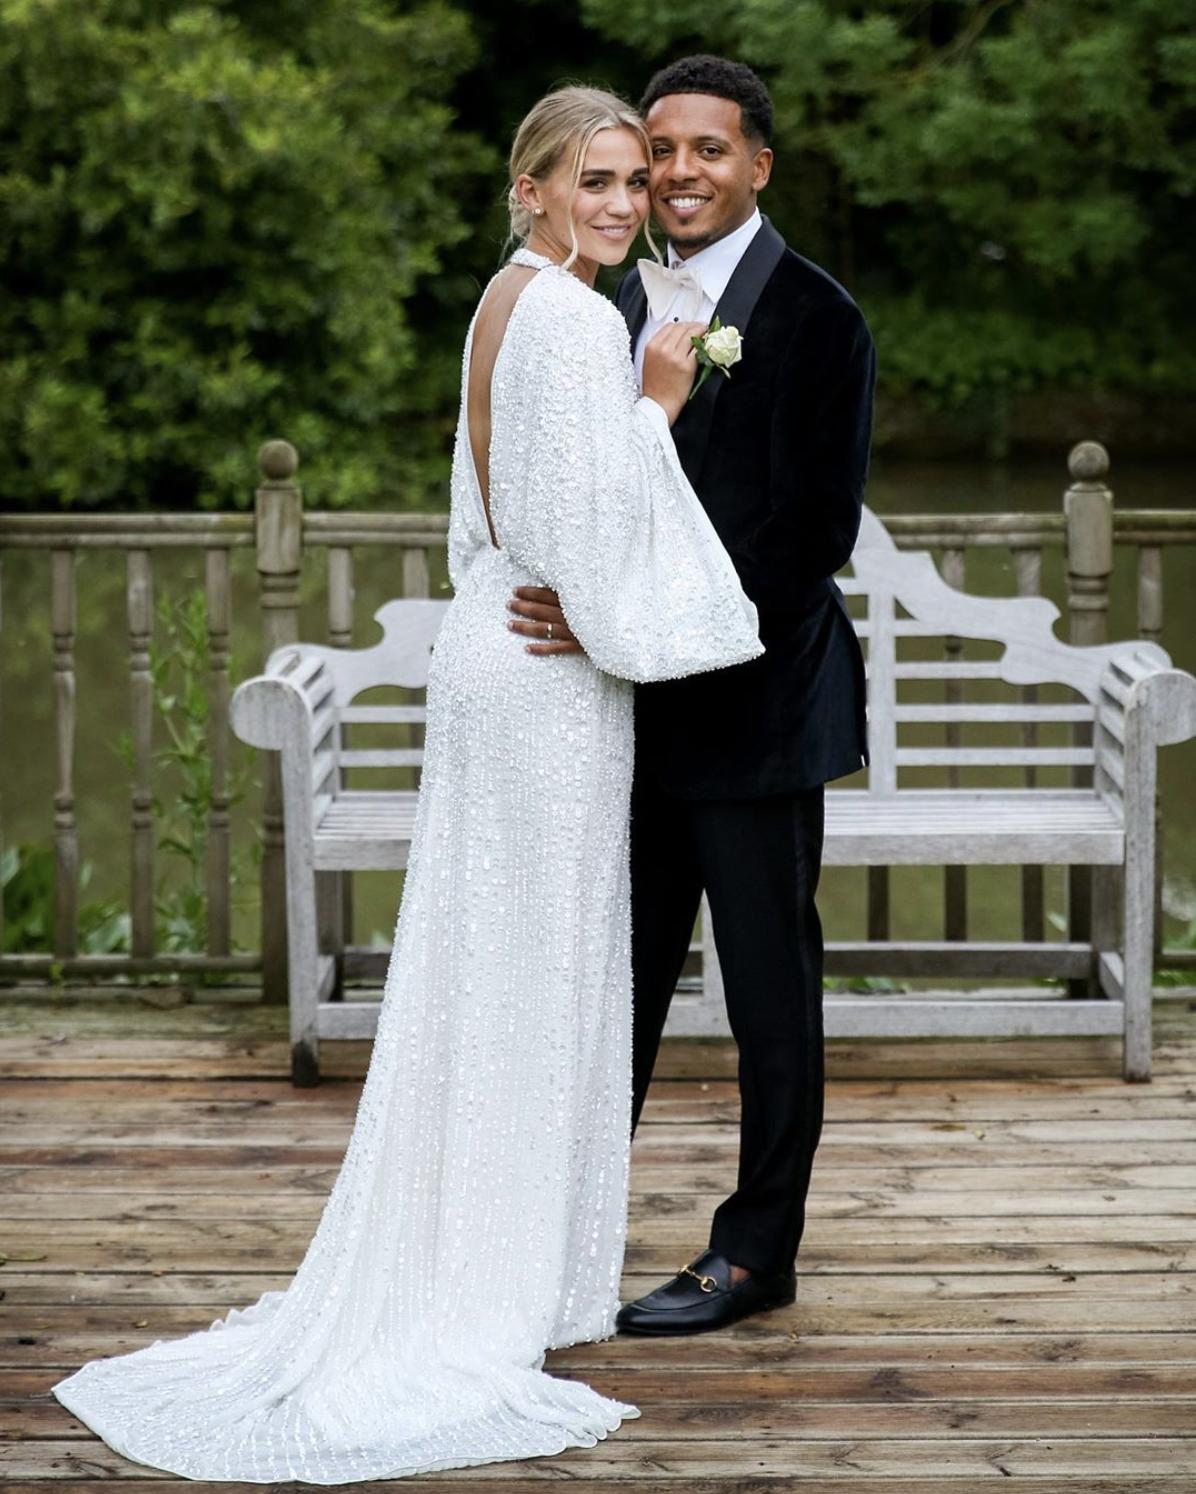 Asos Edition Ciara Sequin Kimono Sleeve Wedding Dress White Myonewedding Co Uk In 2020 Wedding Dresses Asos Wedding Dress Real Brides Wedding Dresses